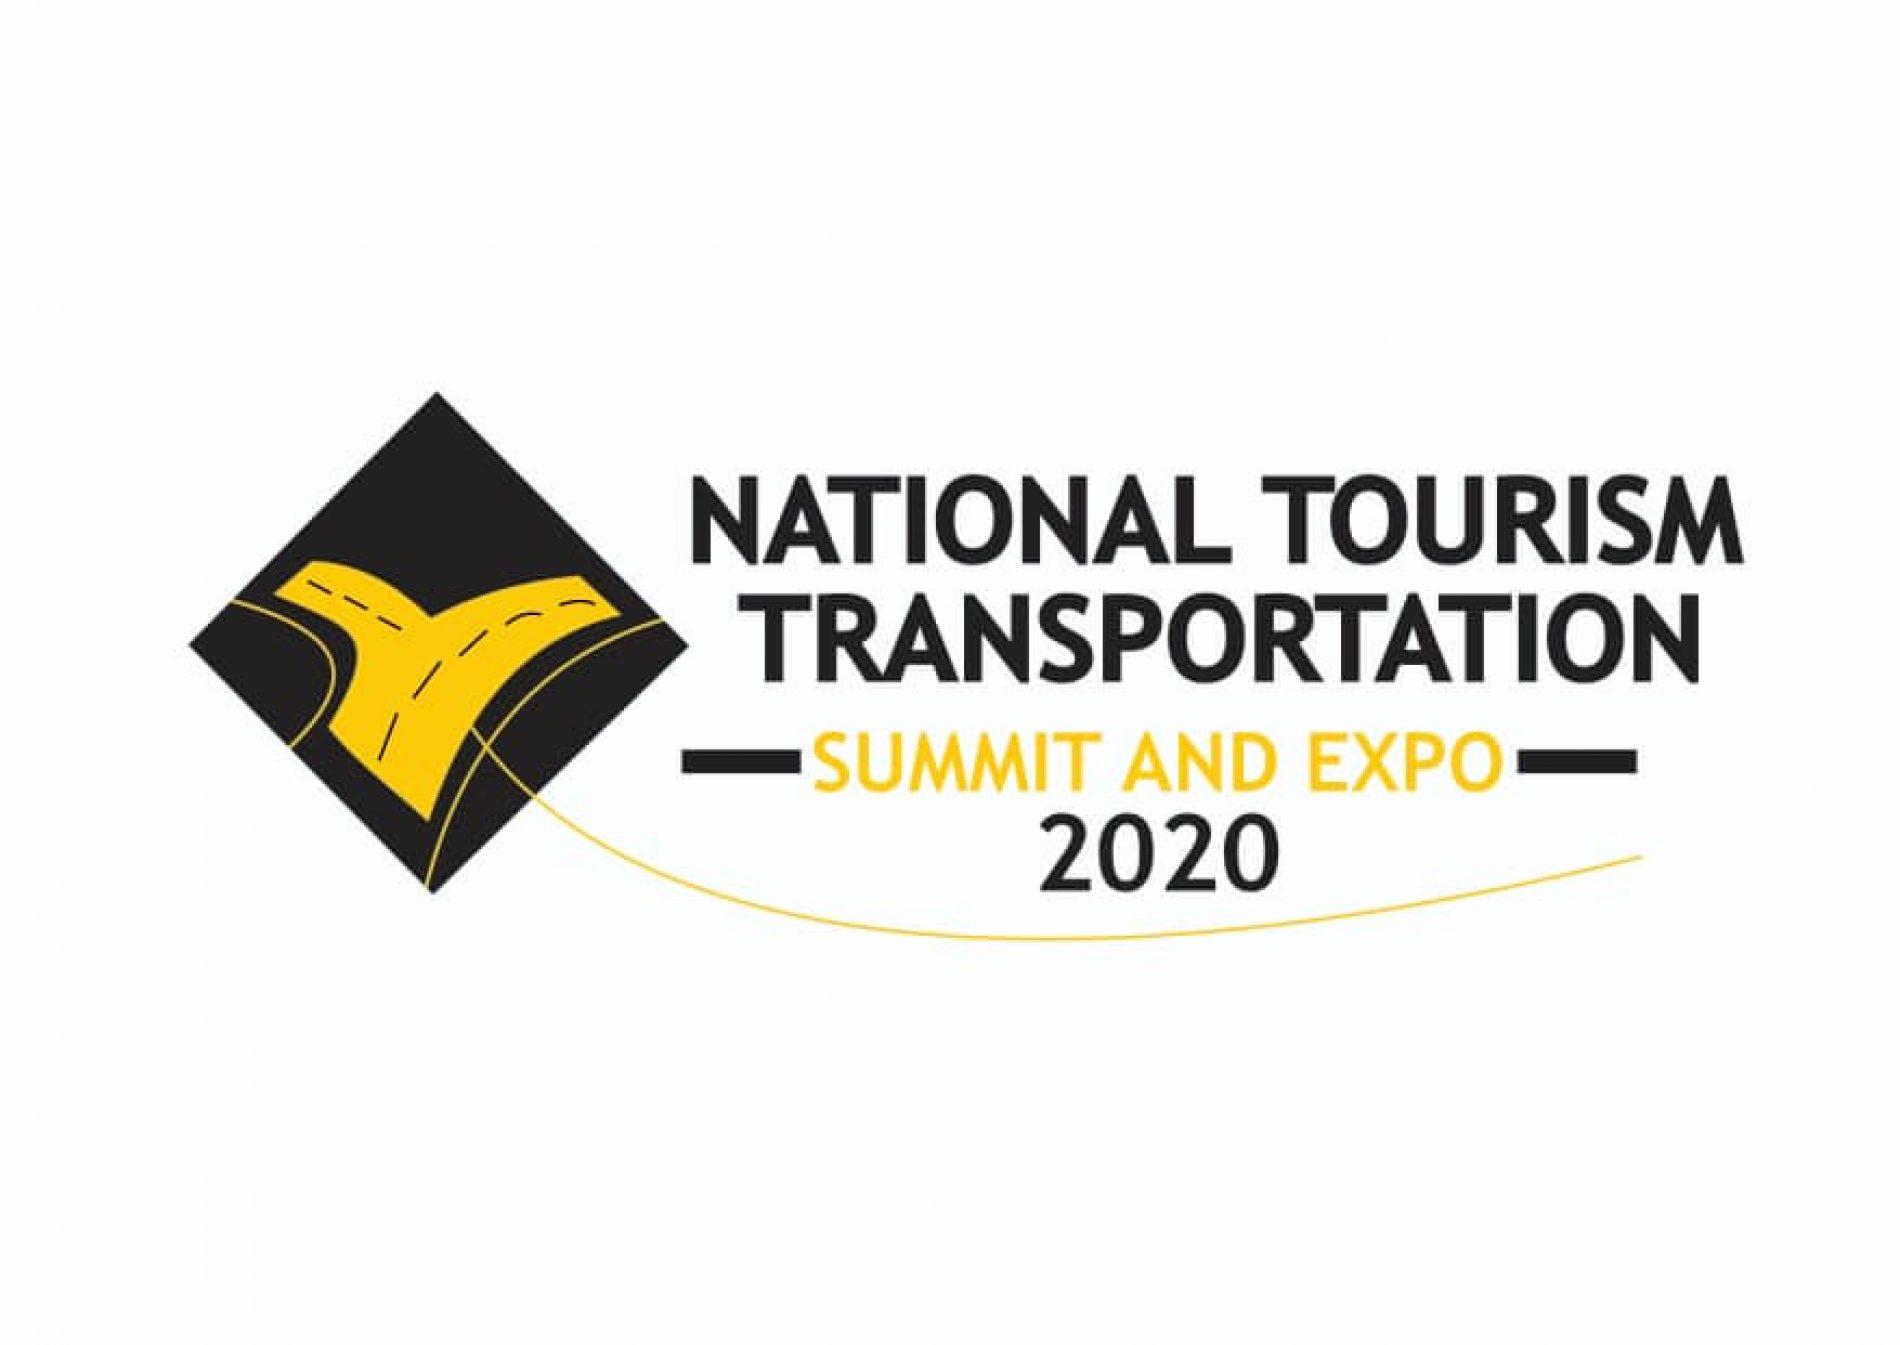 ITPN POSTPONED 3RD NATIONAL TOURISM TRANSPORTATION SUMMIT & EXPO 2020